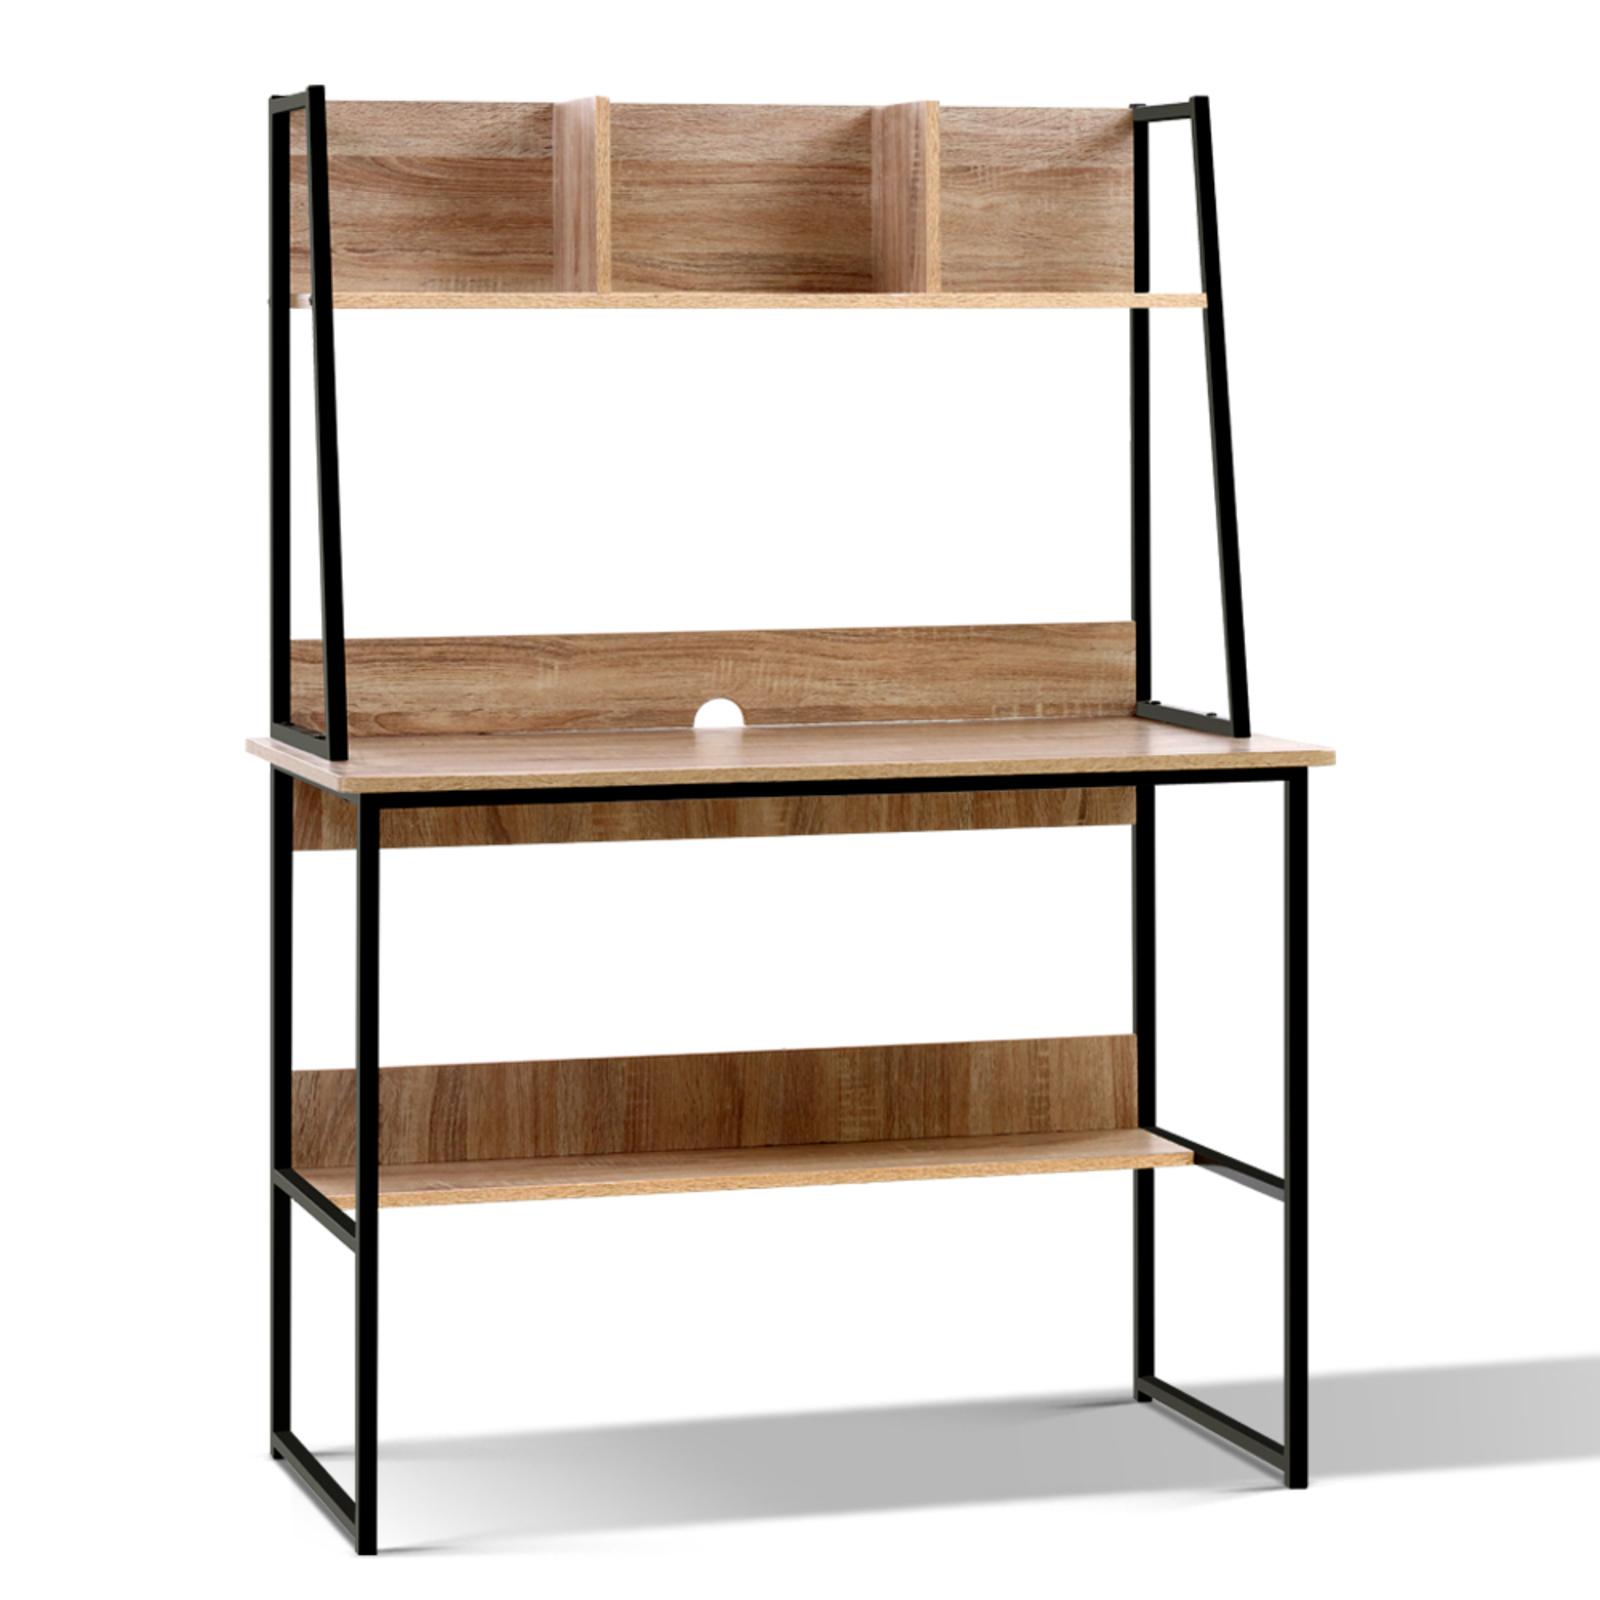 Artiss Office Computer Desk Study Table Workstation Bookshelf Storage Oak